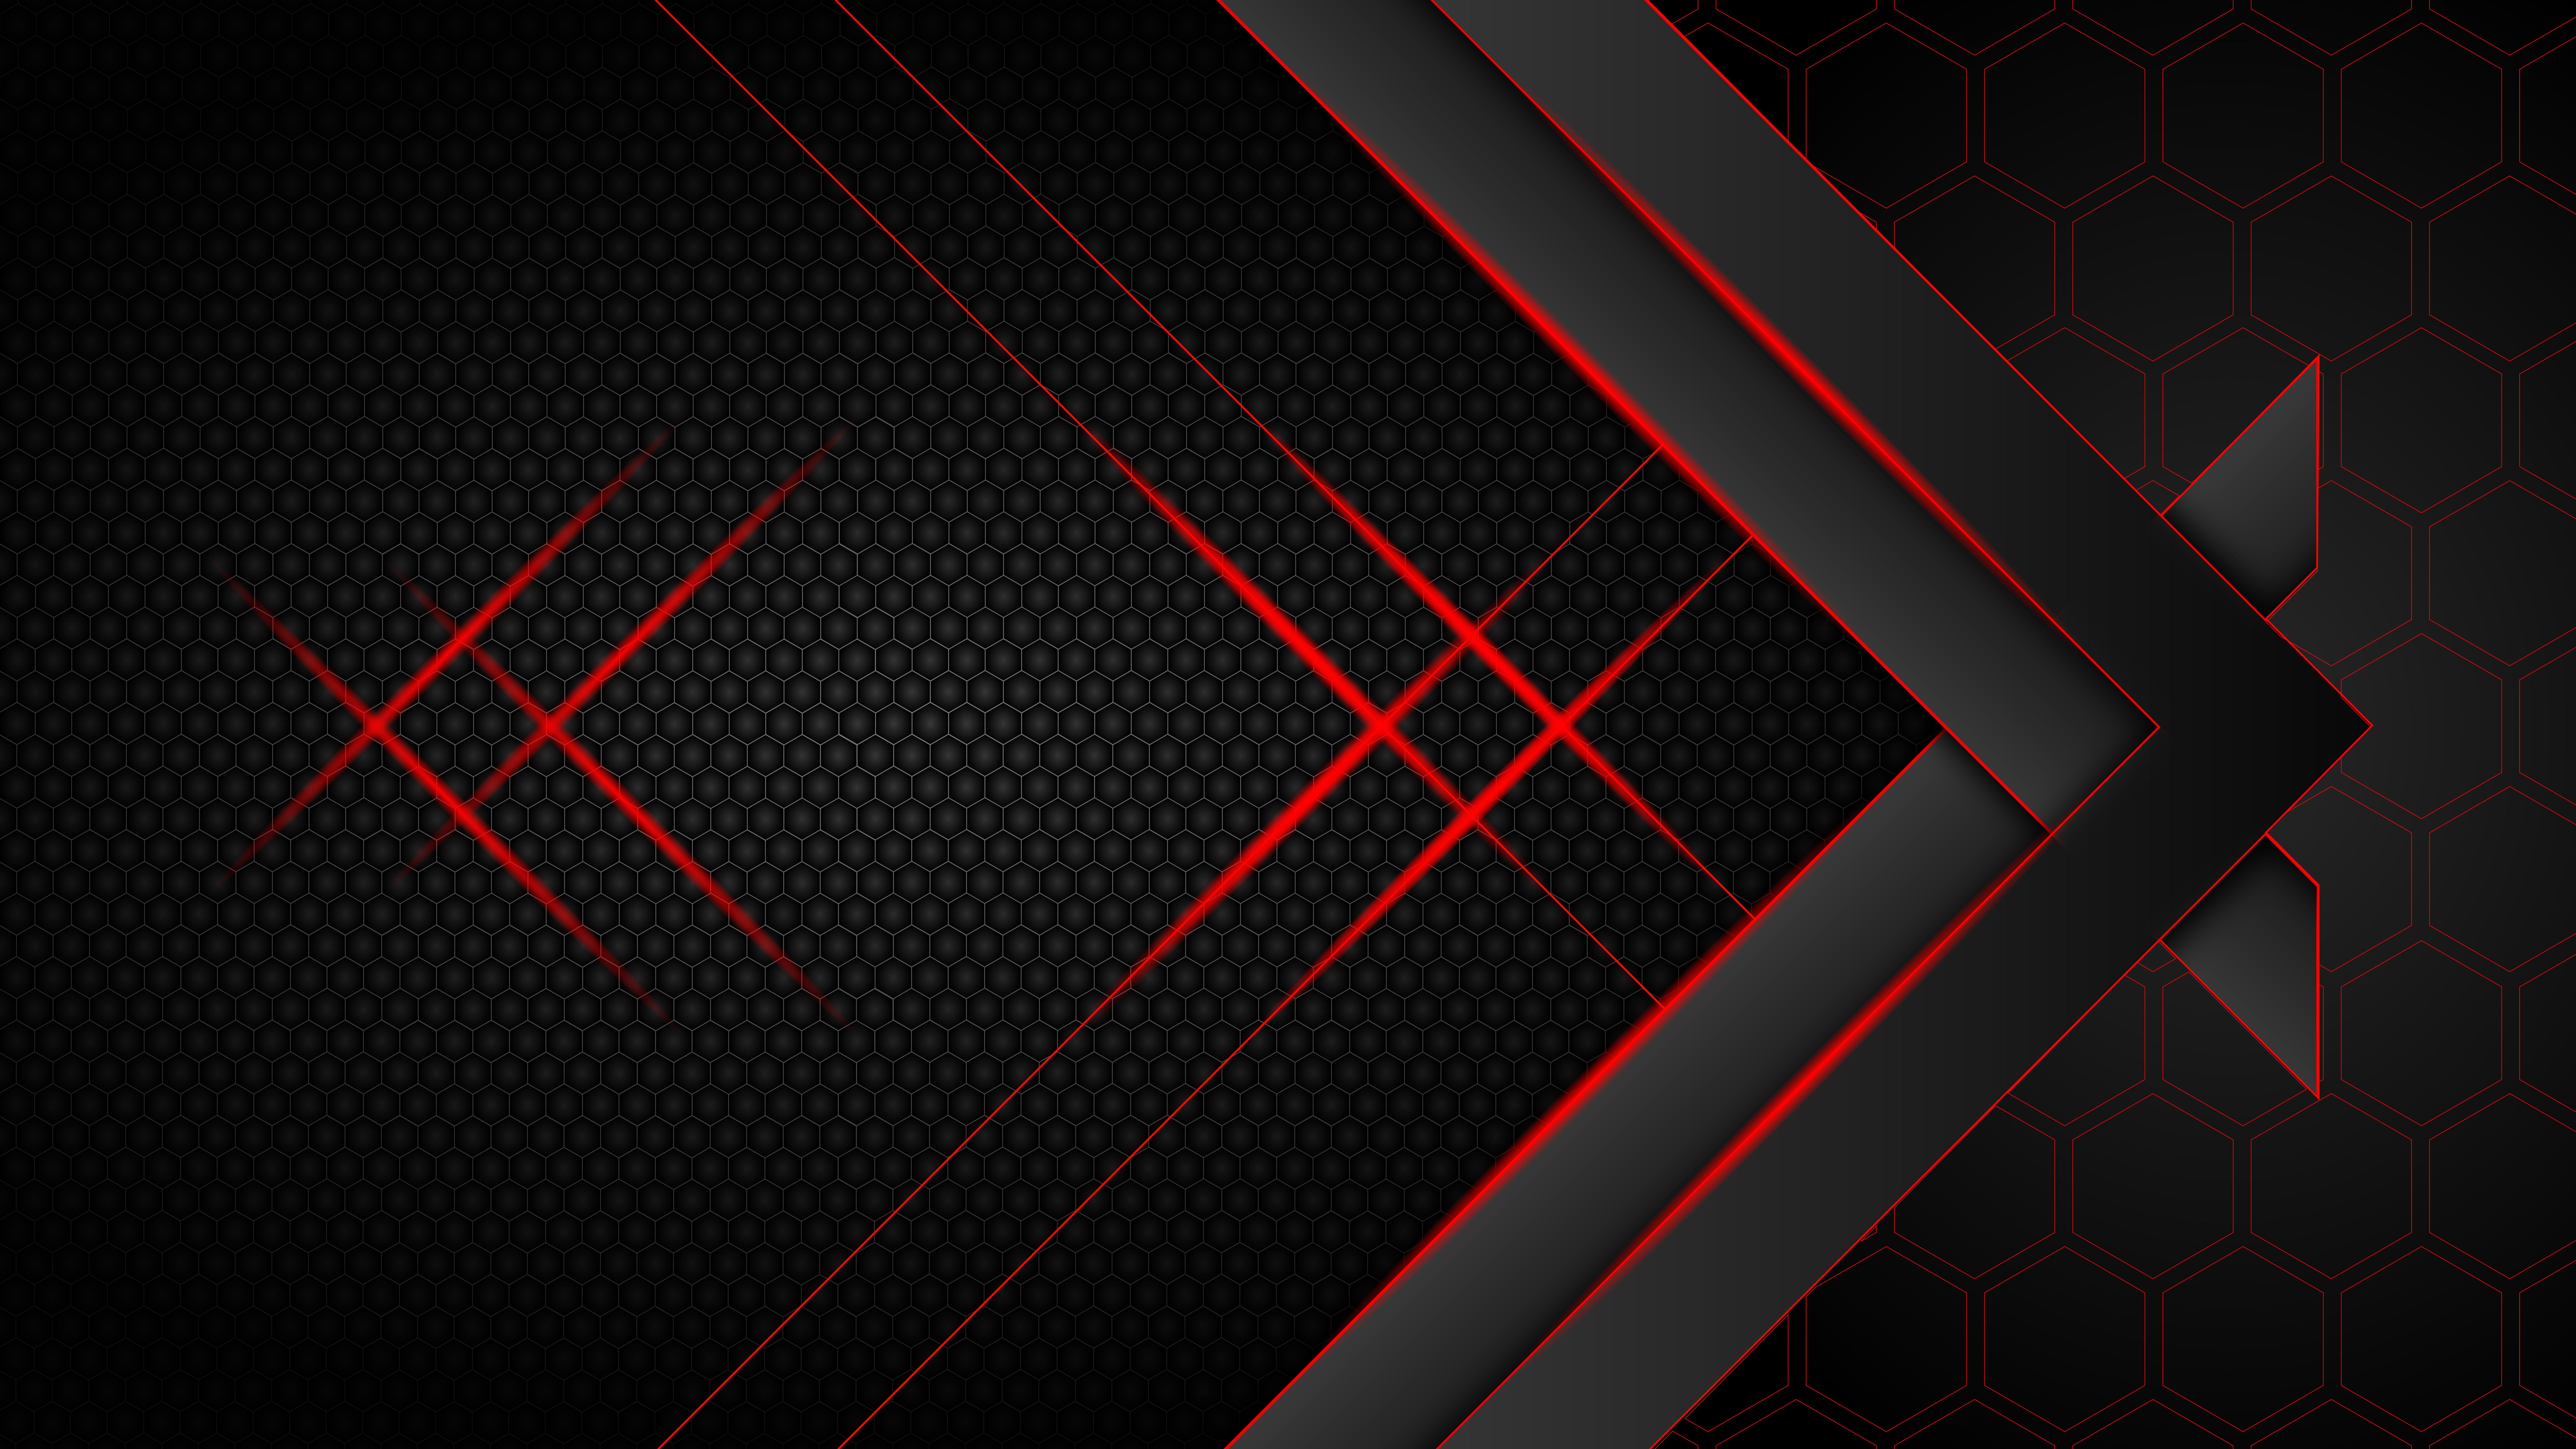 futuristic dark hexagon 4k 1634162515 - Futuristic Dark Hexagon 4k - Futuristic Dark Hexagon wallpapers, Futuristic Dark Hexagon 4k wallpapers